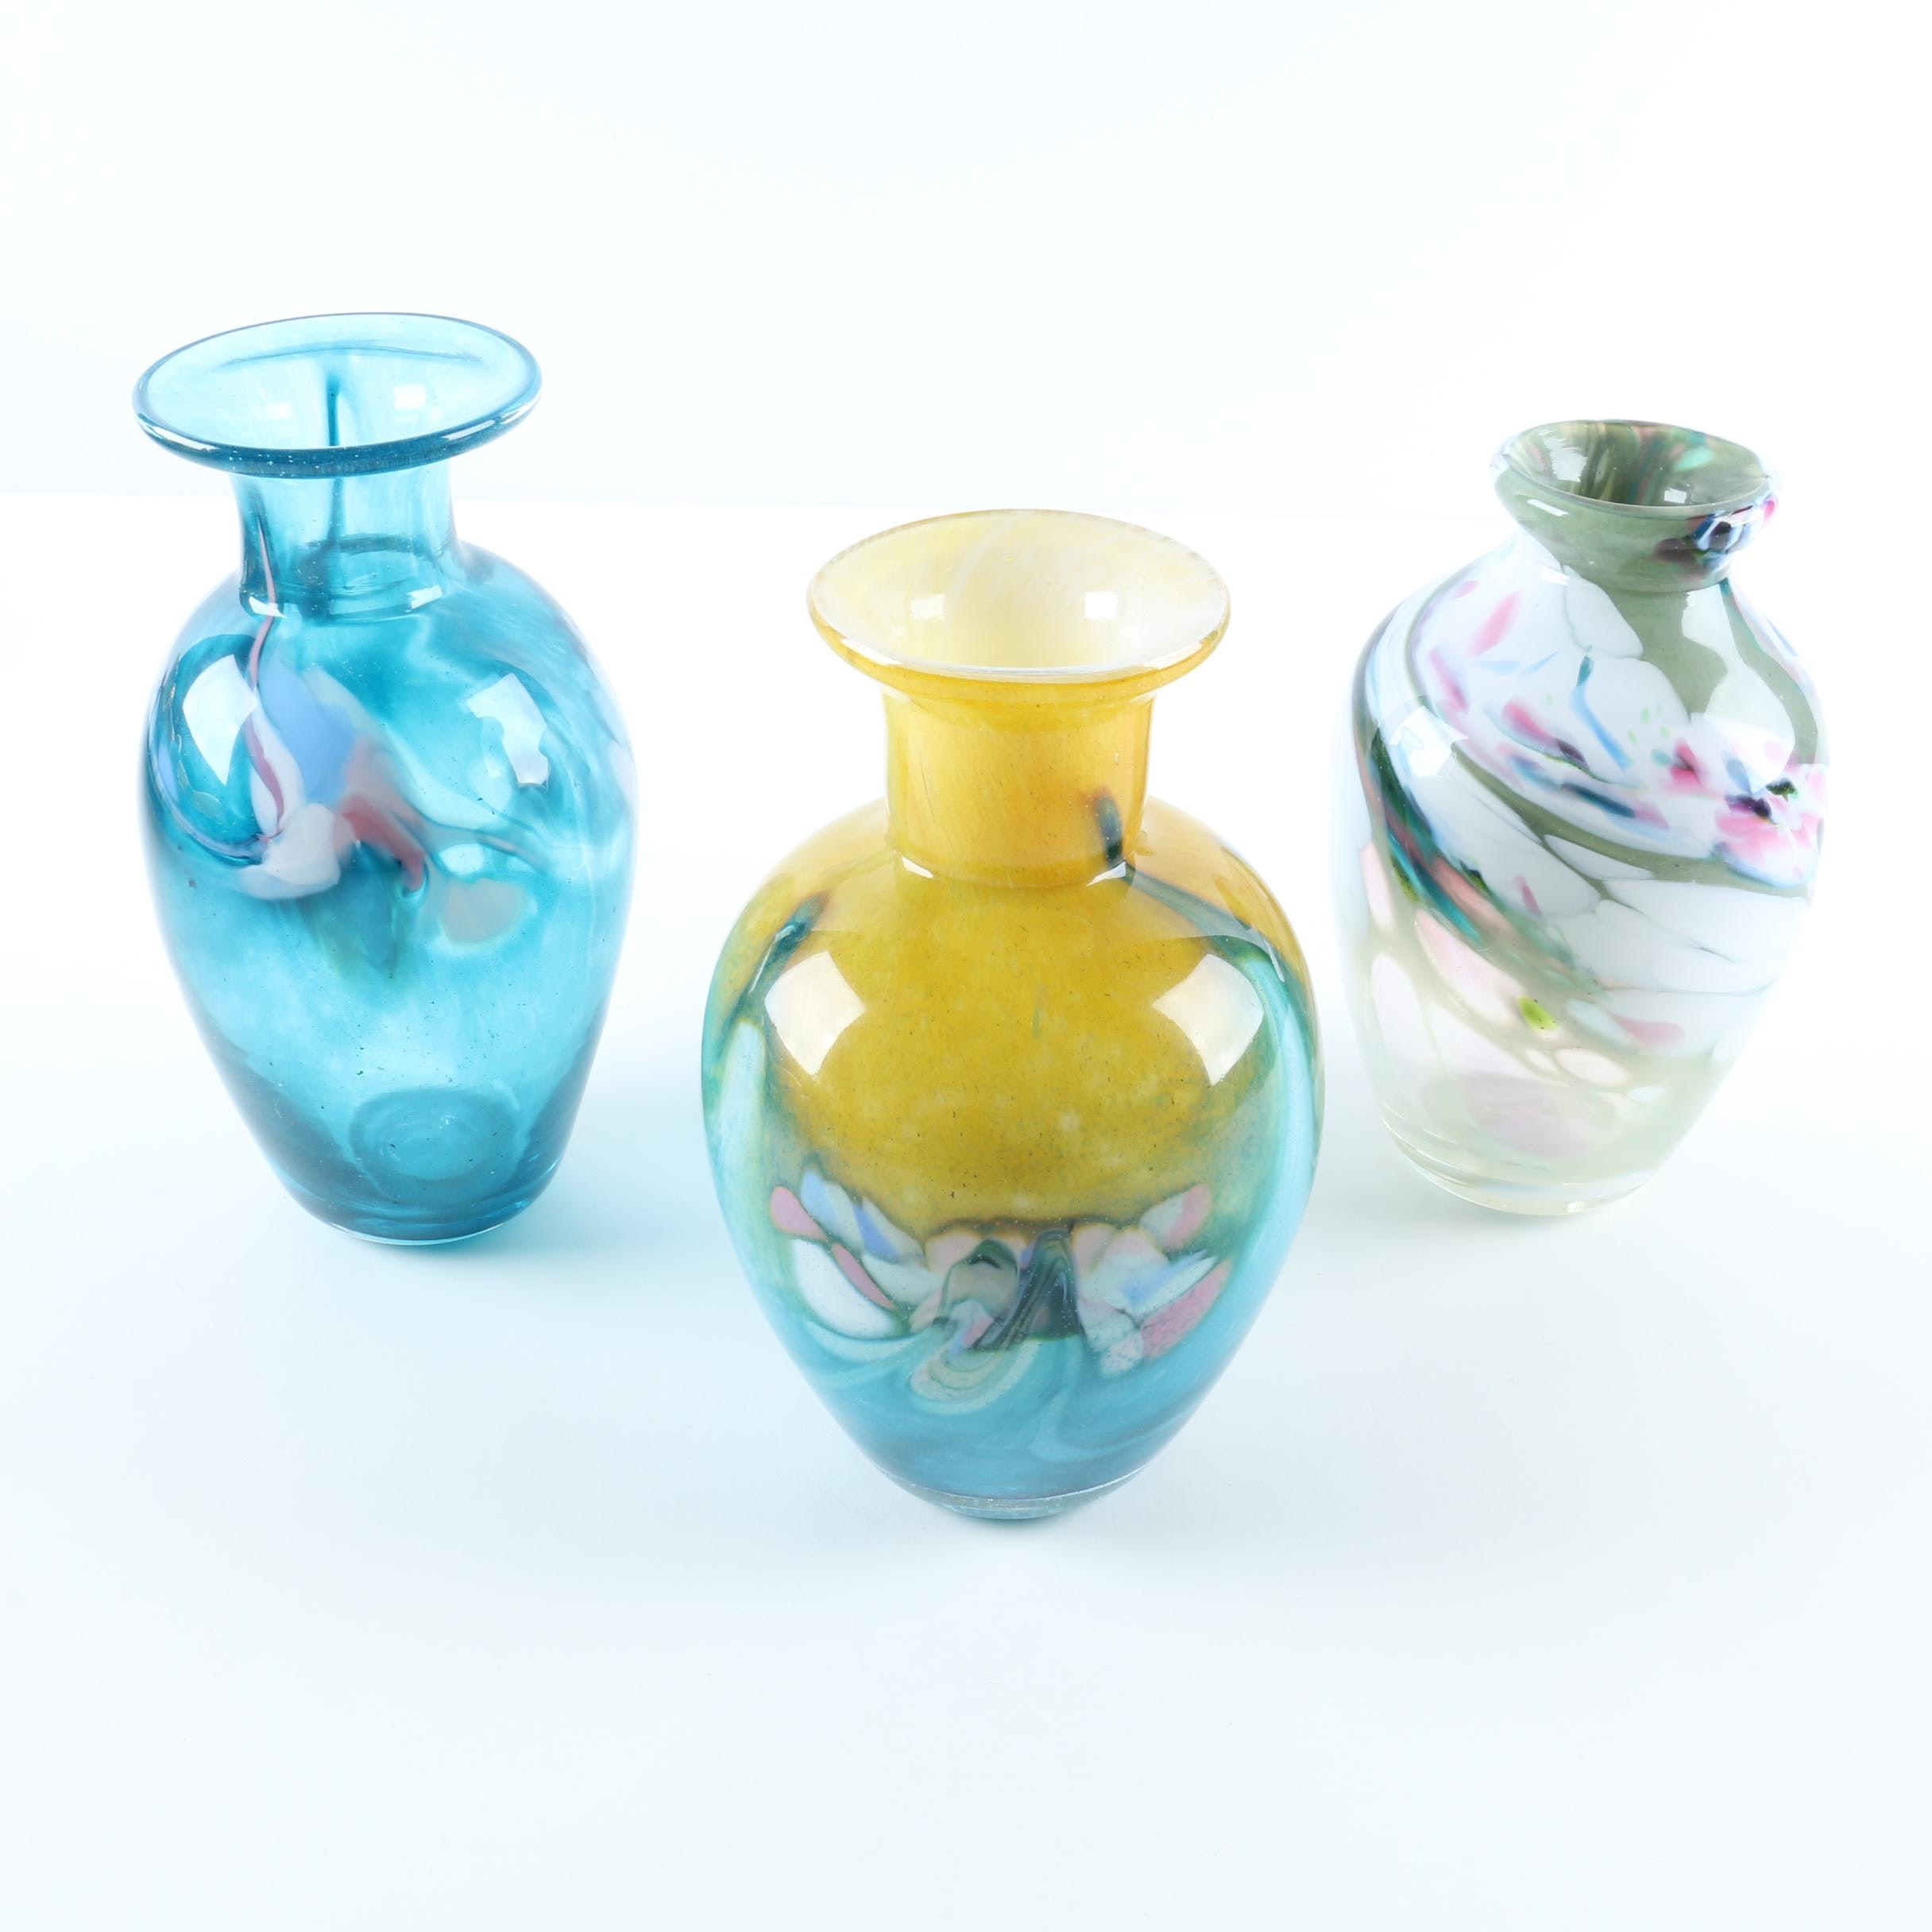 Colorful Handblown Art Glass Bud Vases